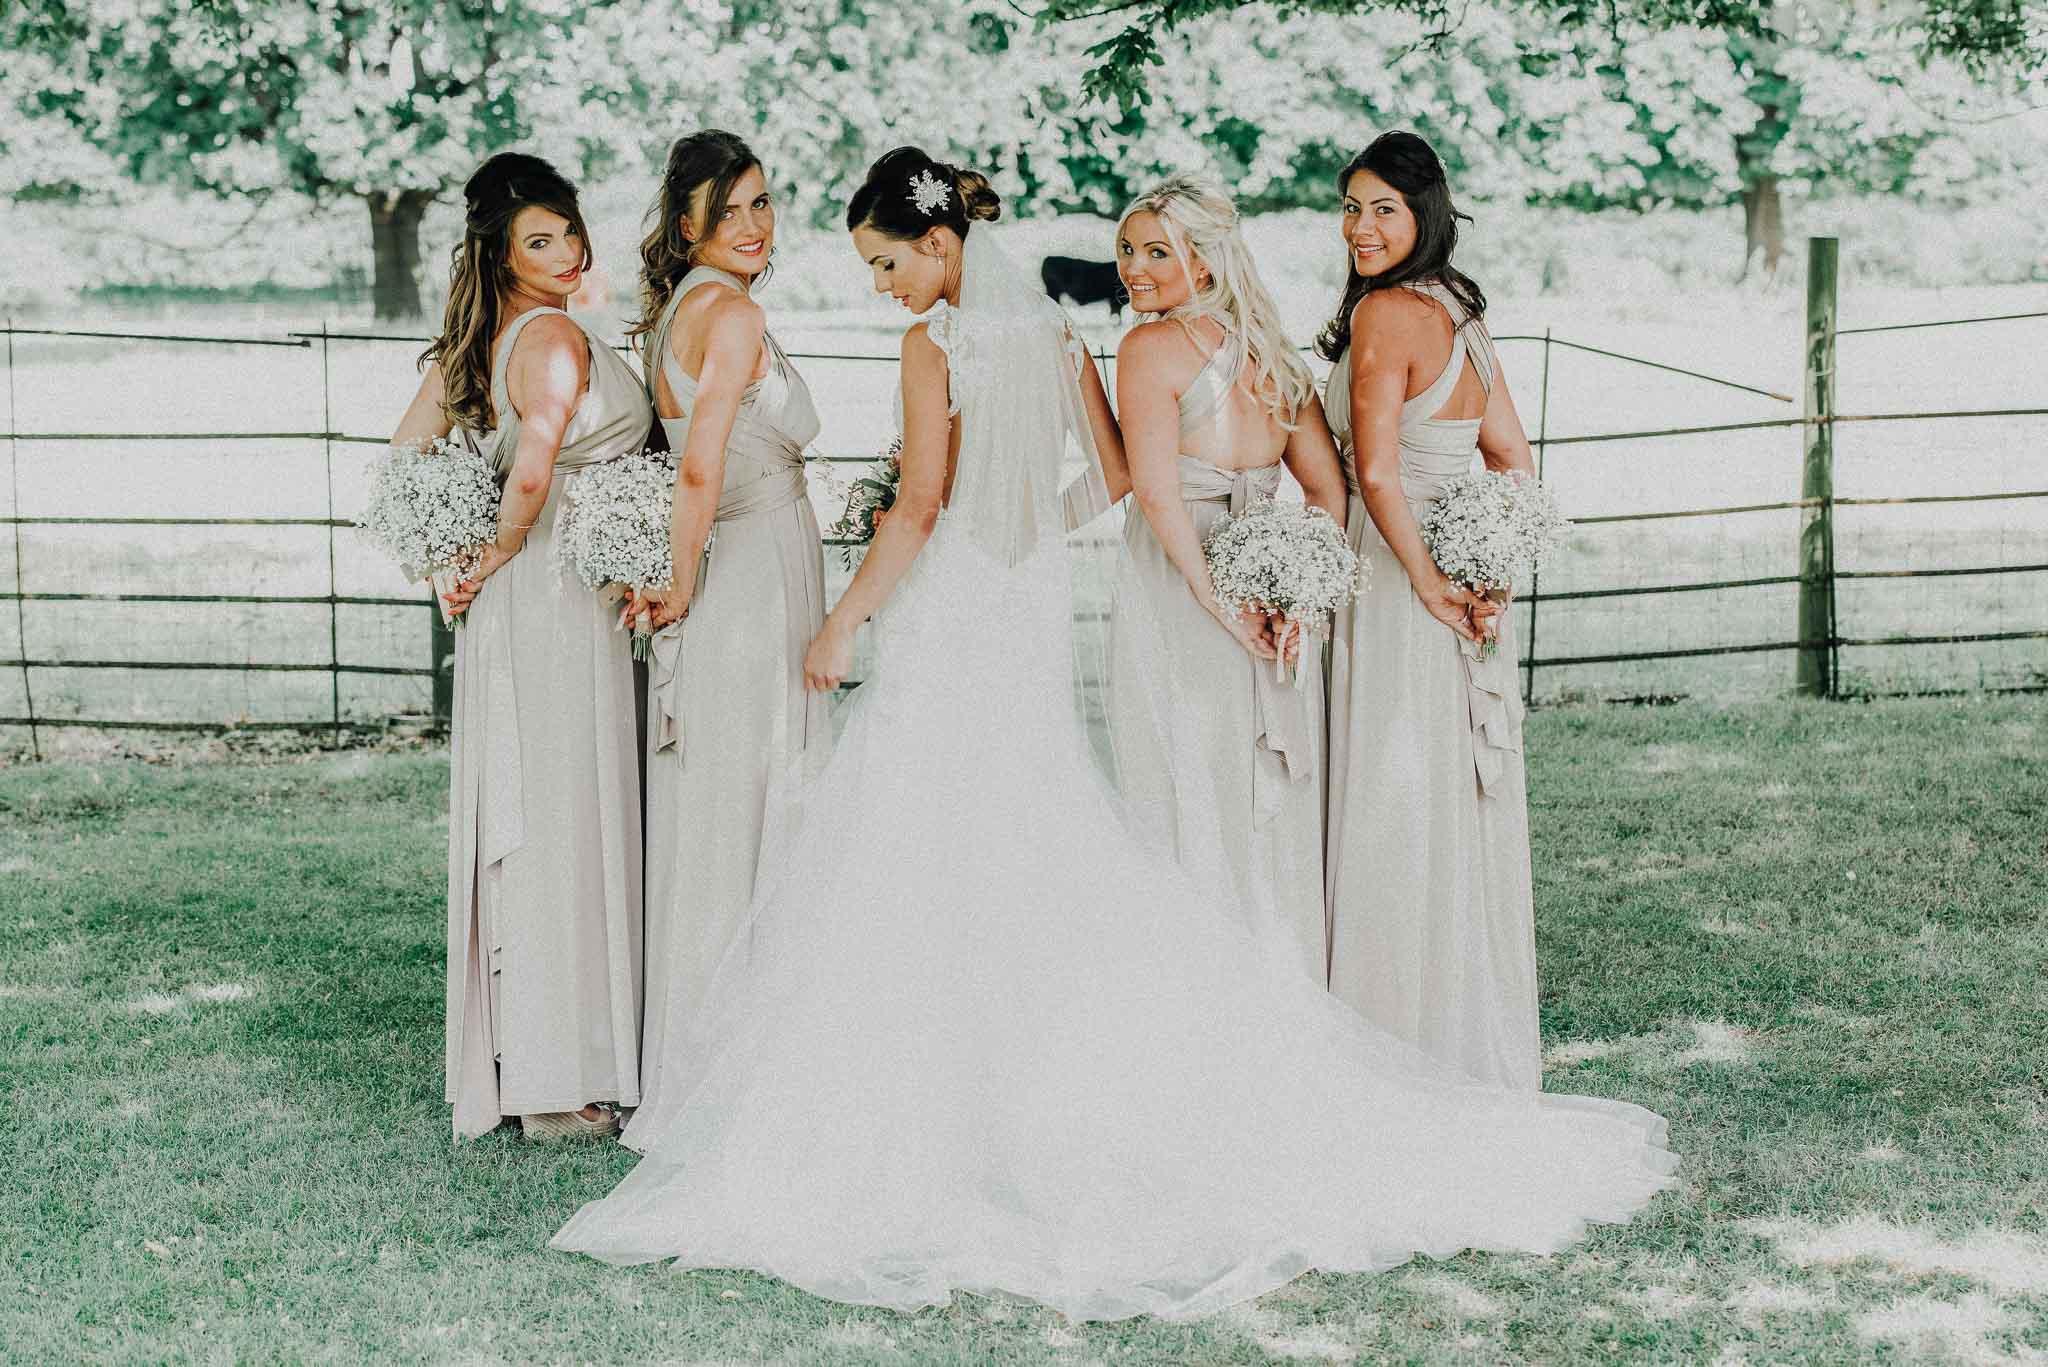 bridesmaids dresses, boho weddings, wedding photographer Milton Keynes